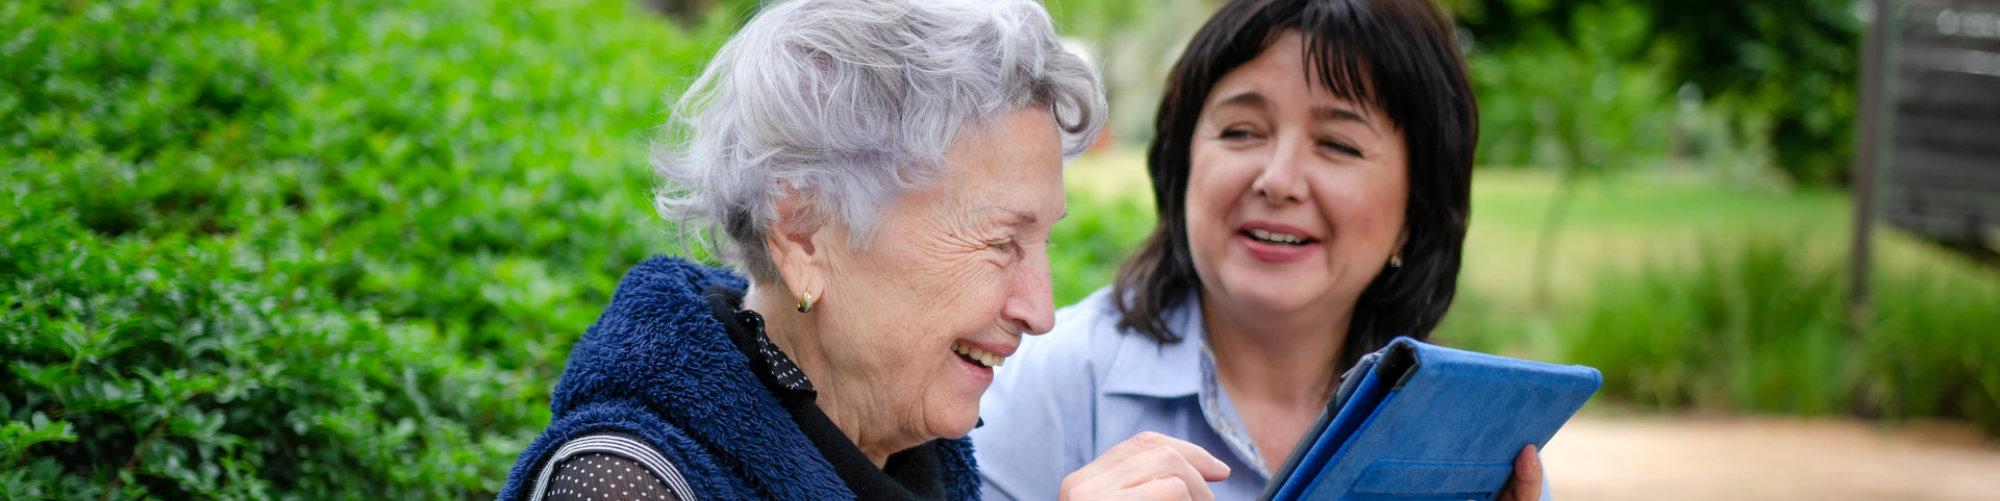 senior patient and her caregiver